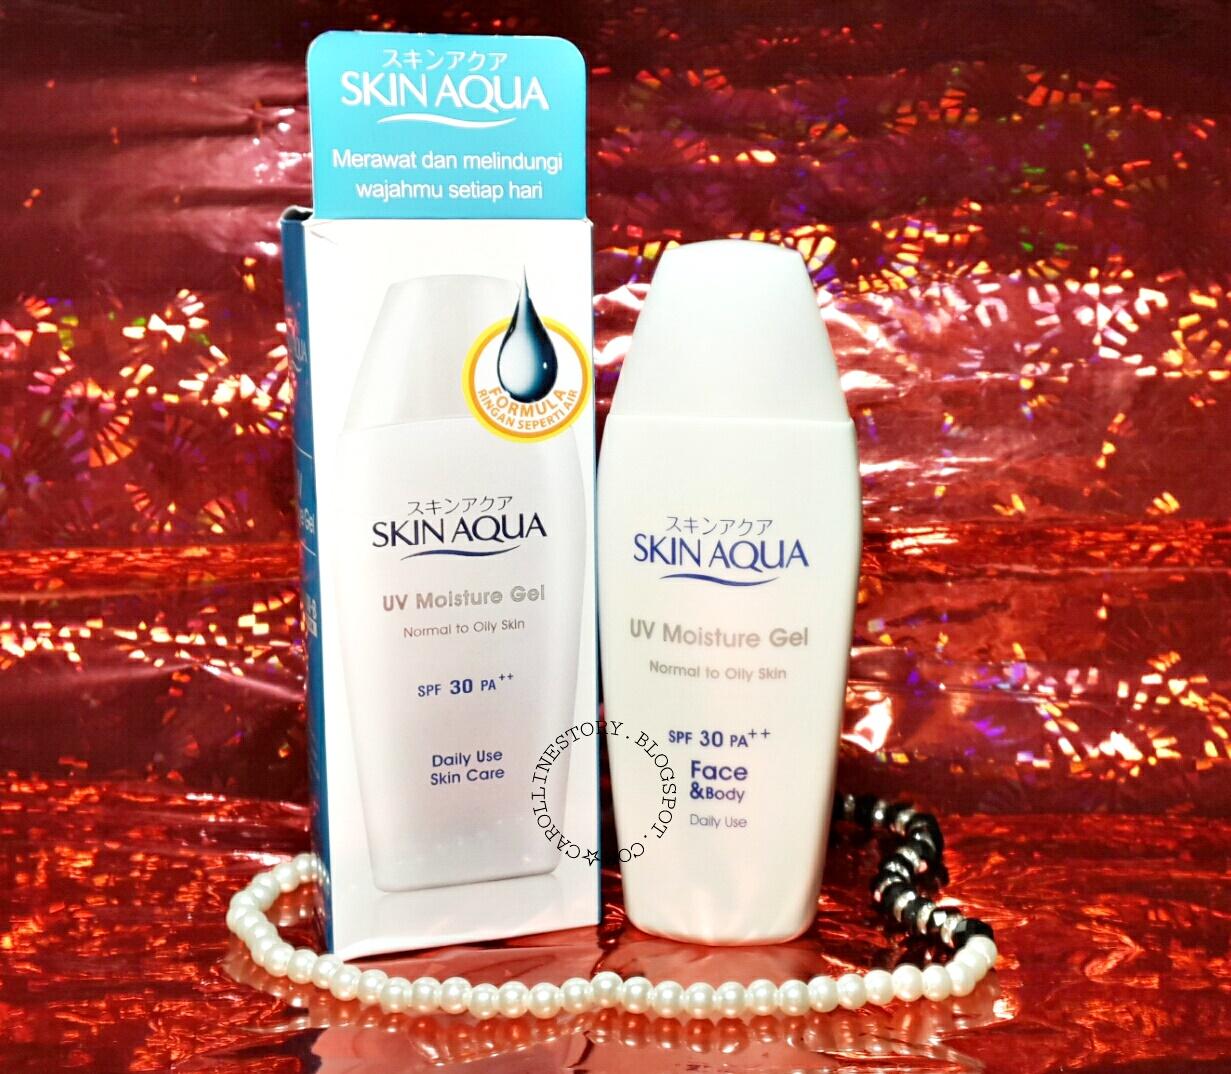 Review Skin Aqua Uv Moisture Gel Spf 30 Pa Sunscreen Bagus Untuk Kulit Berminyak Jerawat Carolline S Beauty Blog